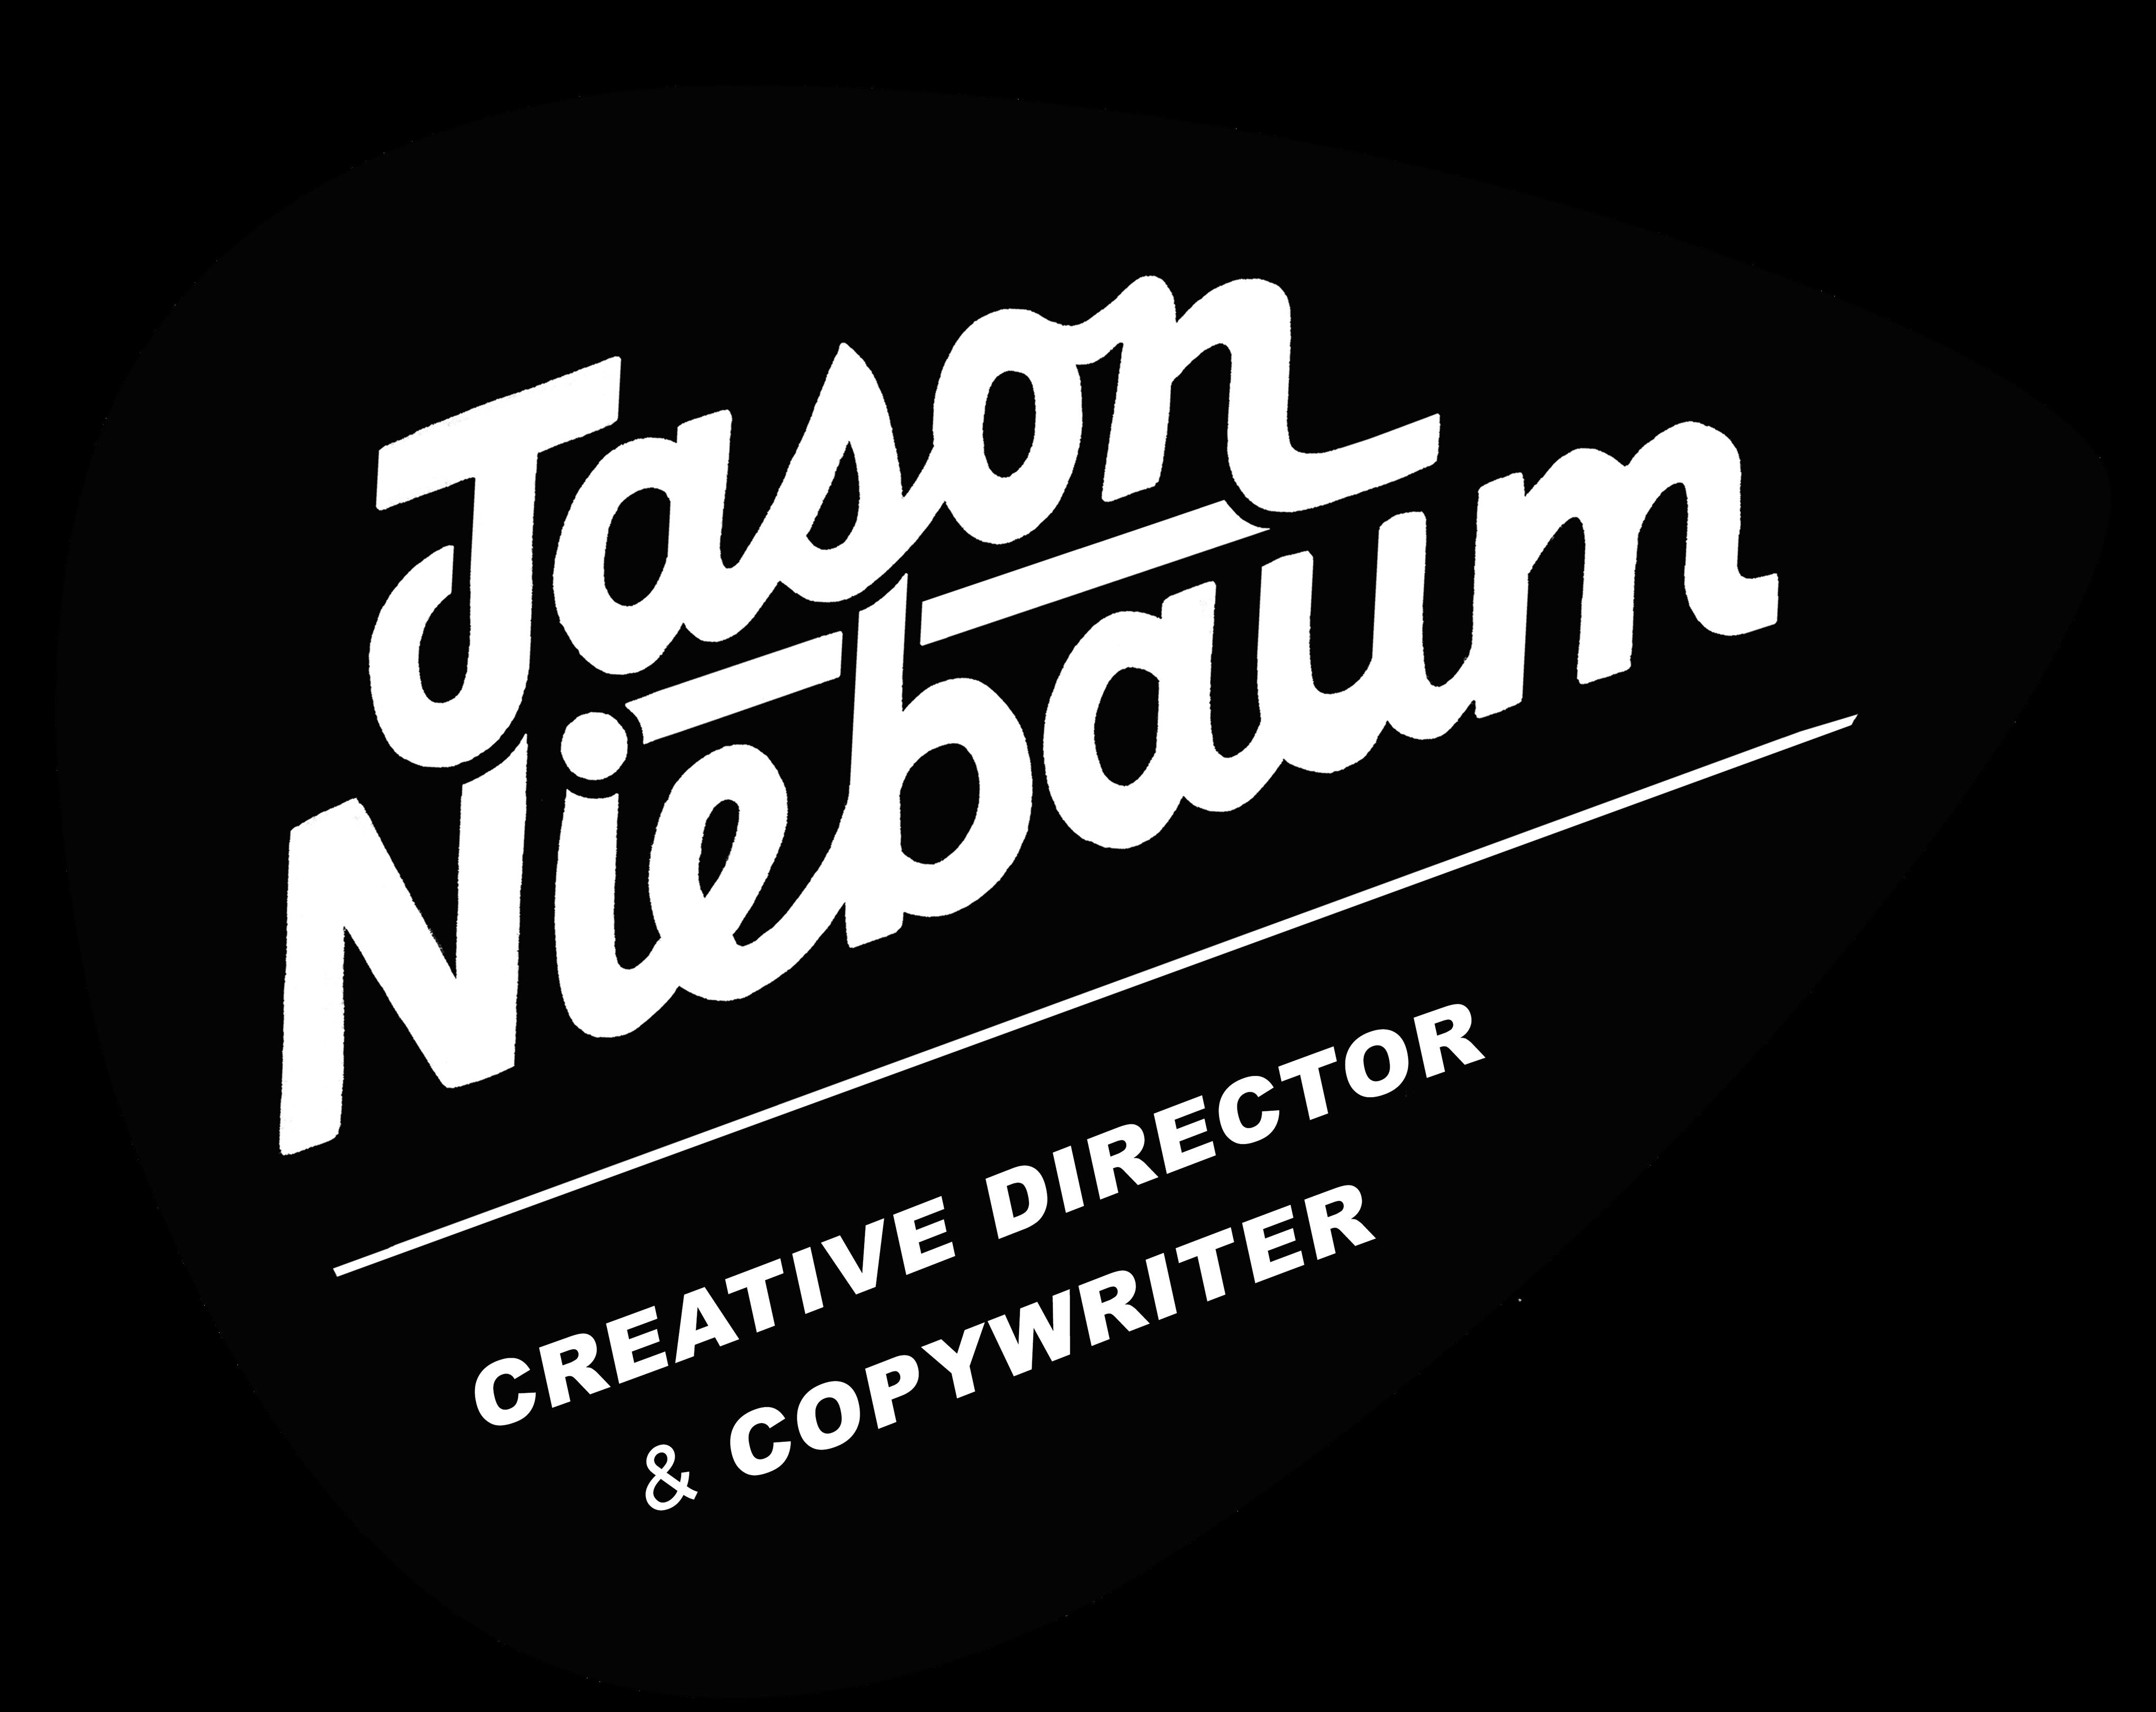 Jason Niebaum